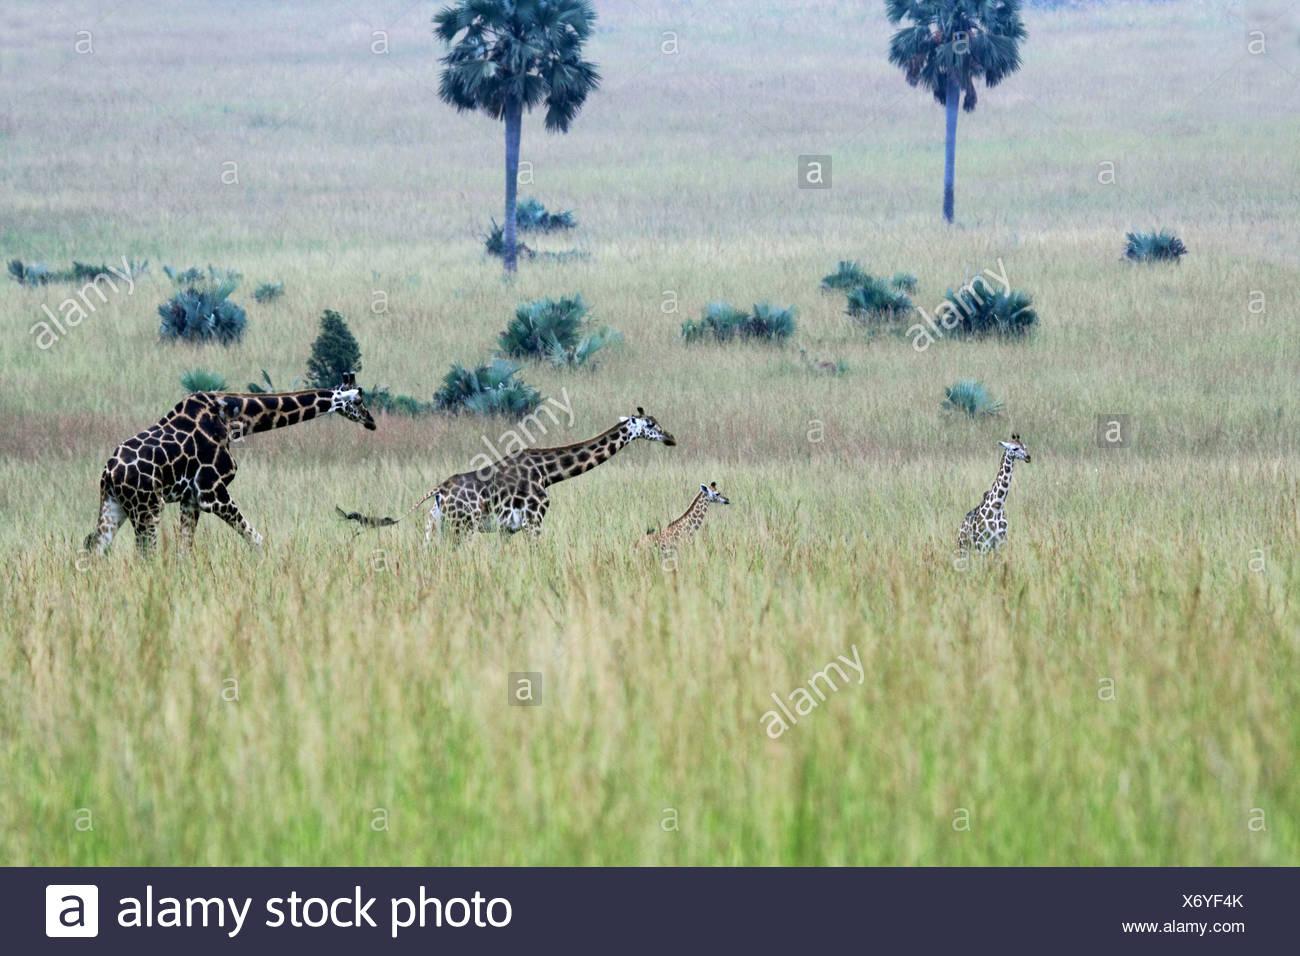 Rothschild's giraffe, Rothschild giraffe, Baringo Giraffe, Ugandan Giraffe (Giraffa camelopardalis rothschildi), two adult and two young animals in the savanna, Uganda, Murchison Falls National Park - Stock Image